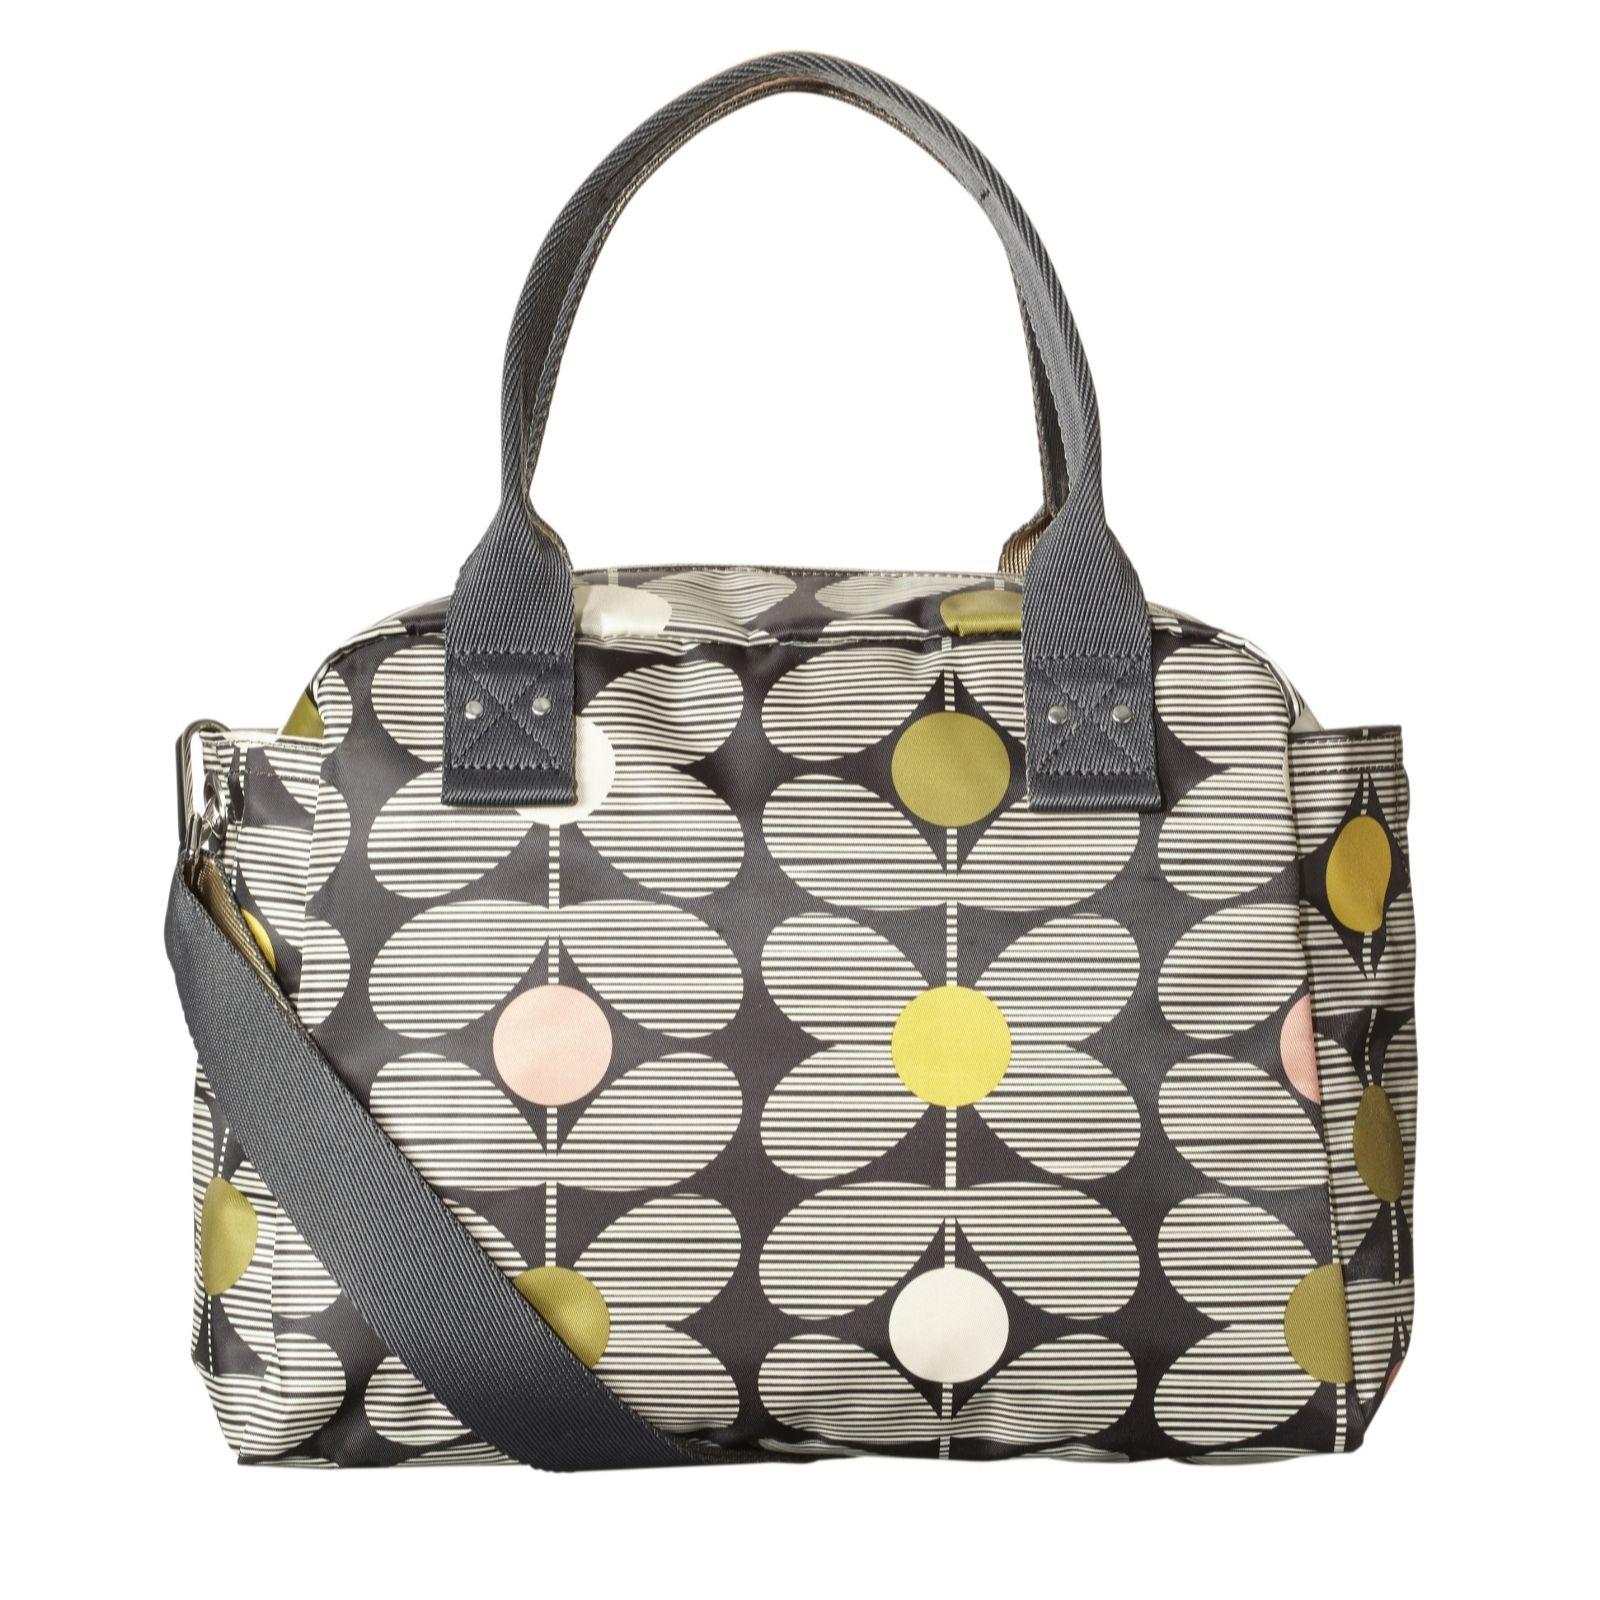 Orla Kiely Zip Top Handbag with Detachable Strap - Page 1 - QVC UK